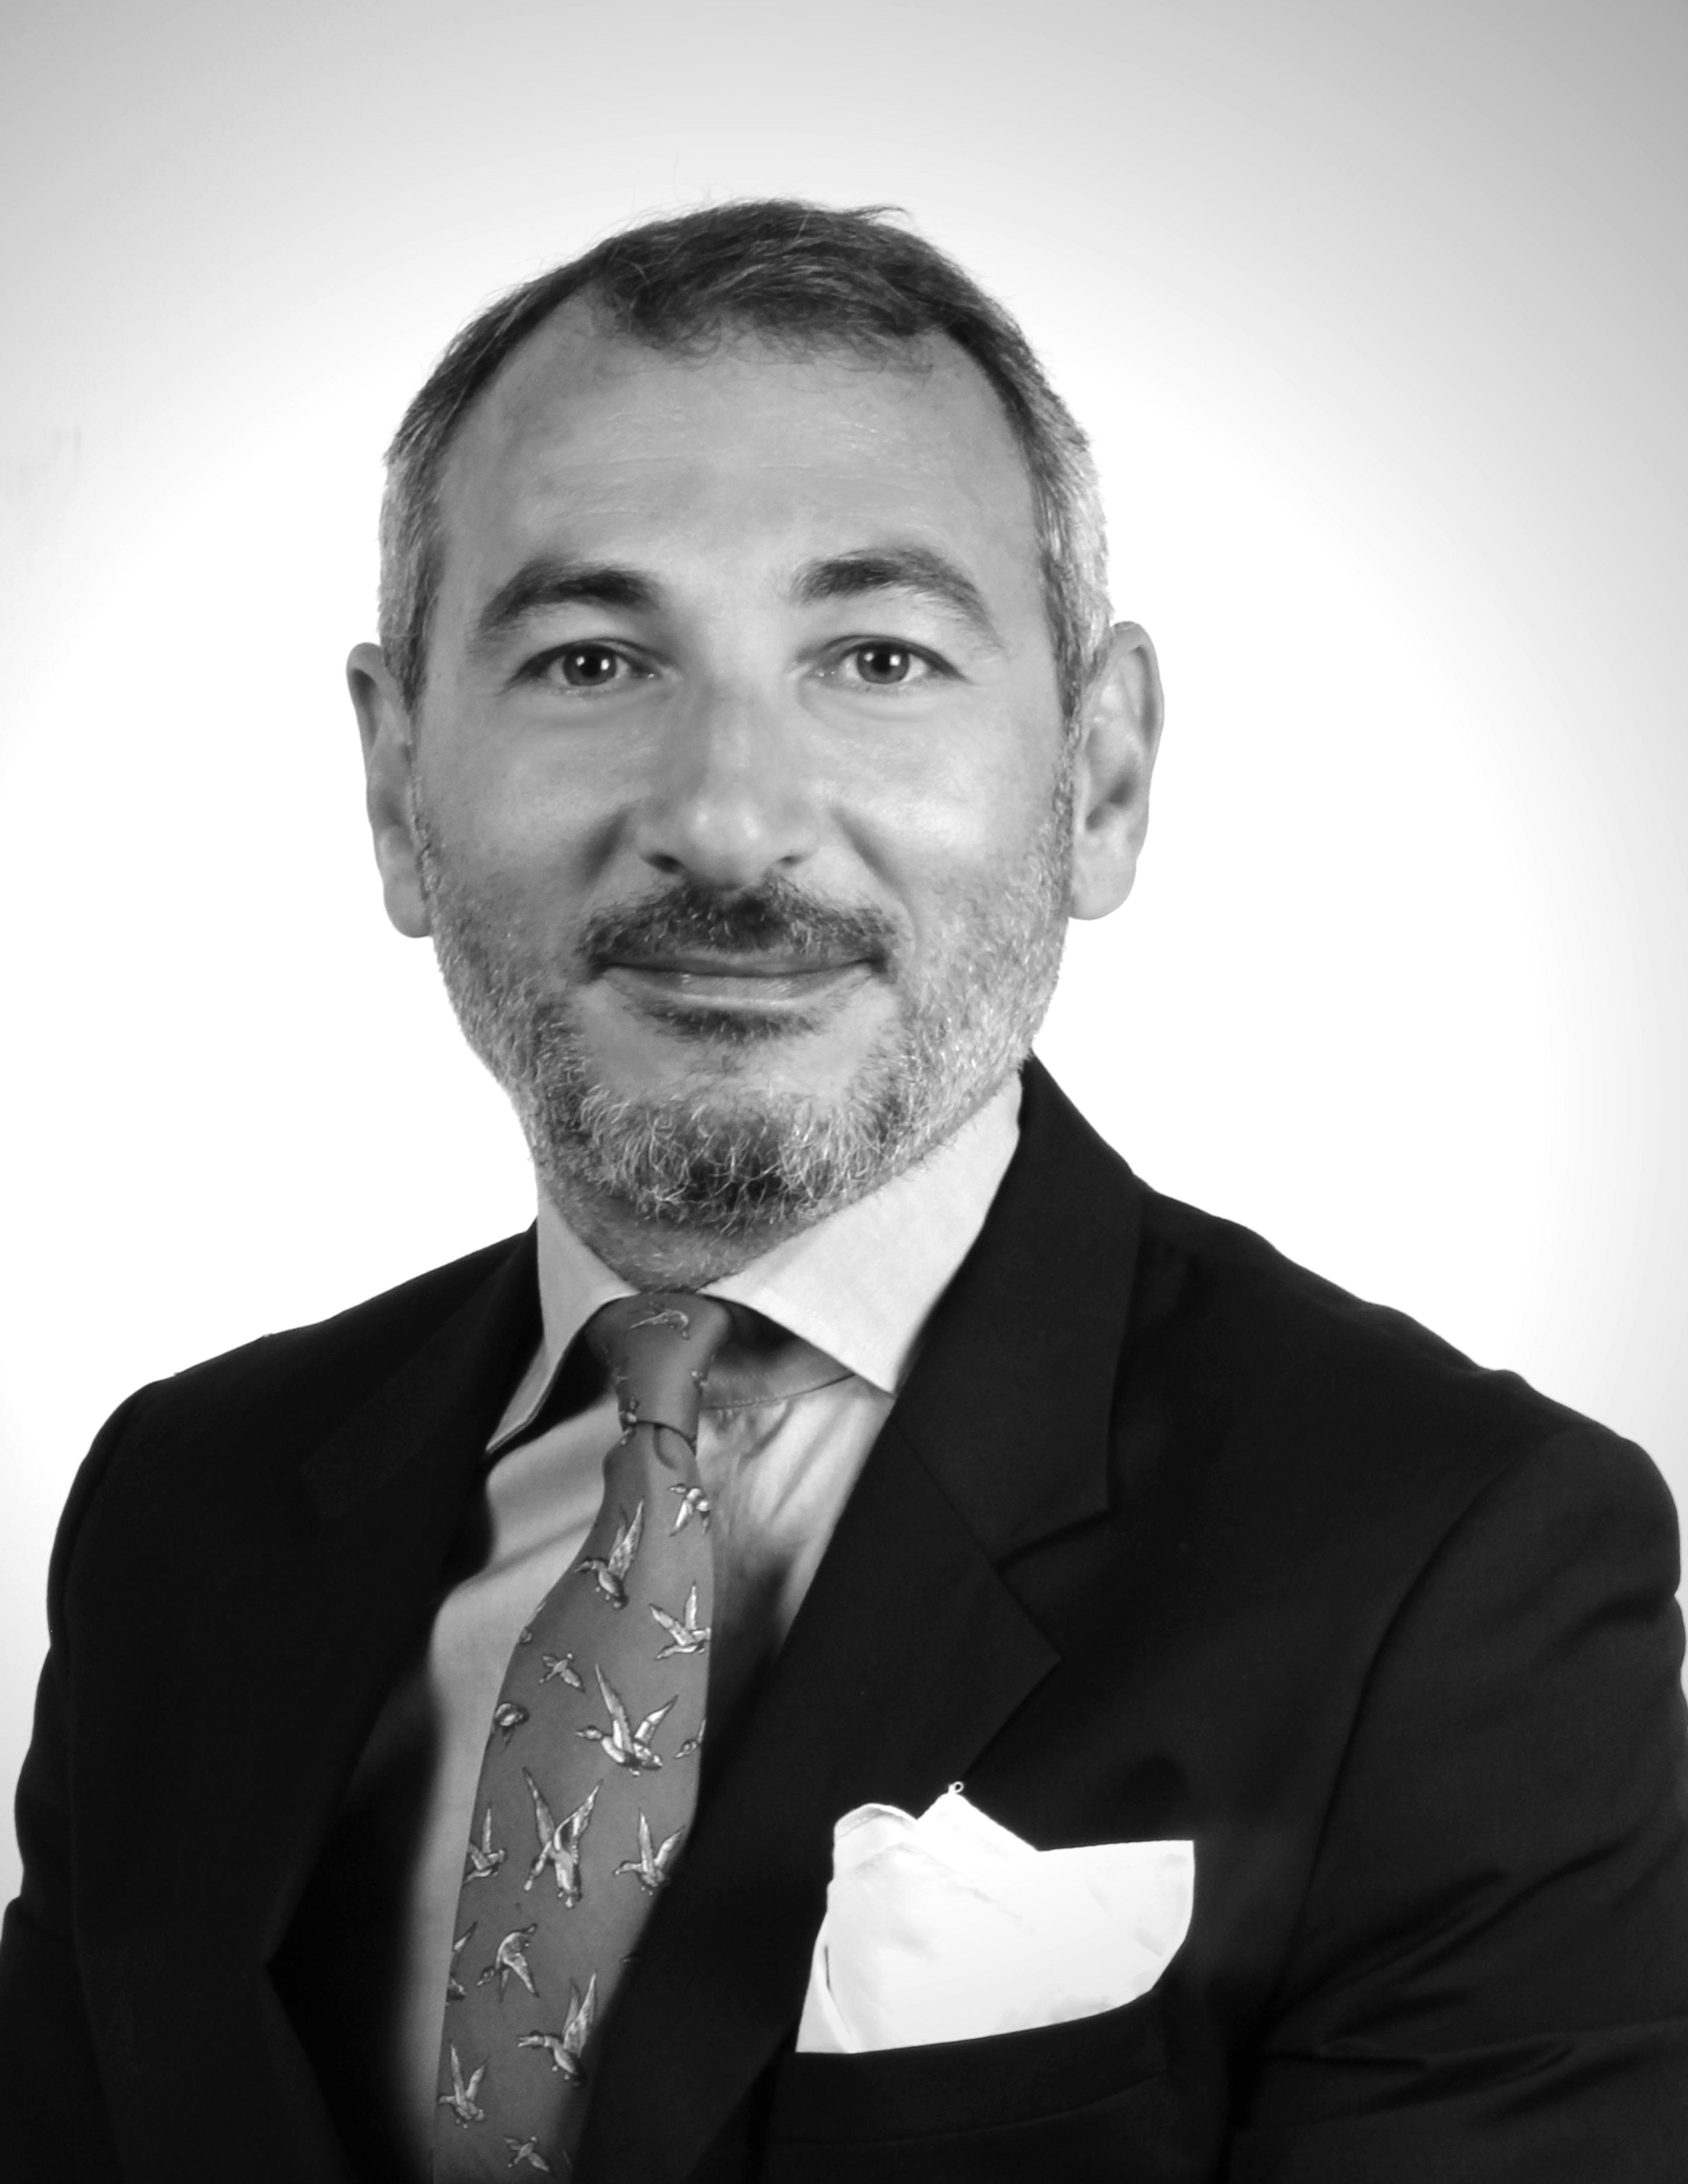 Andrea de Miglio